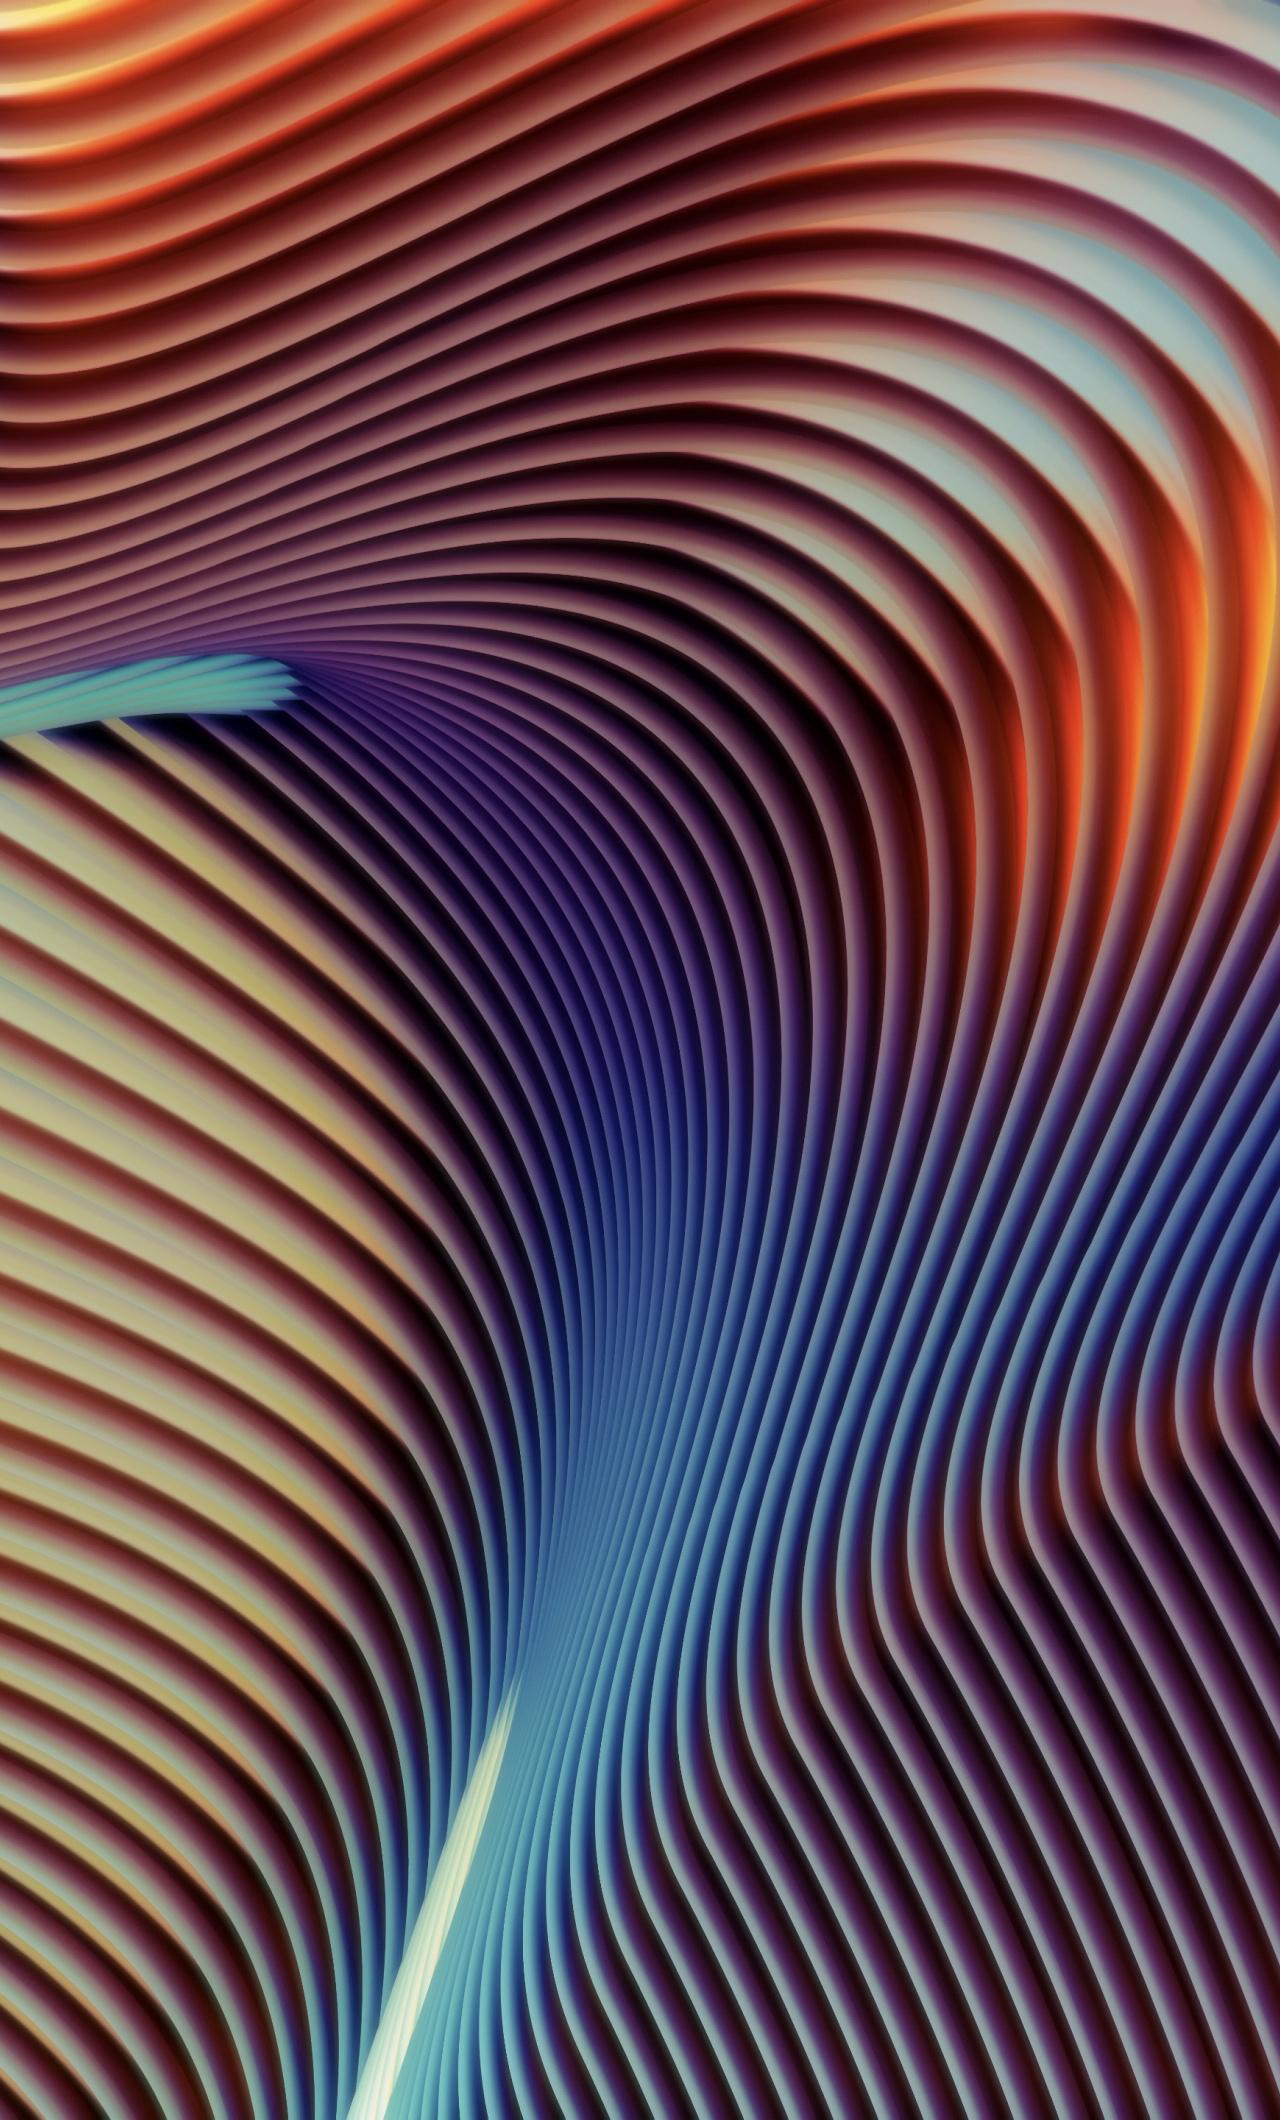 Abstract Colour Wallpaper Samsung , HD Wallpaper & Backgrounds